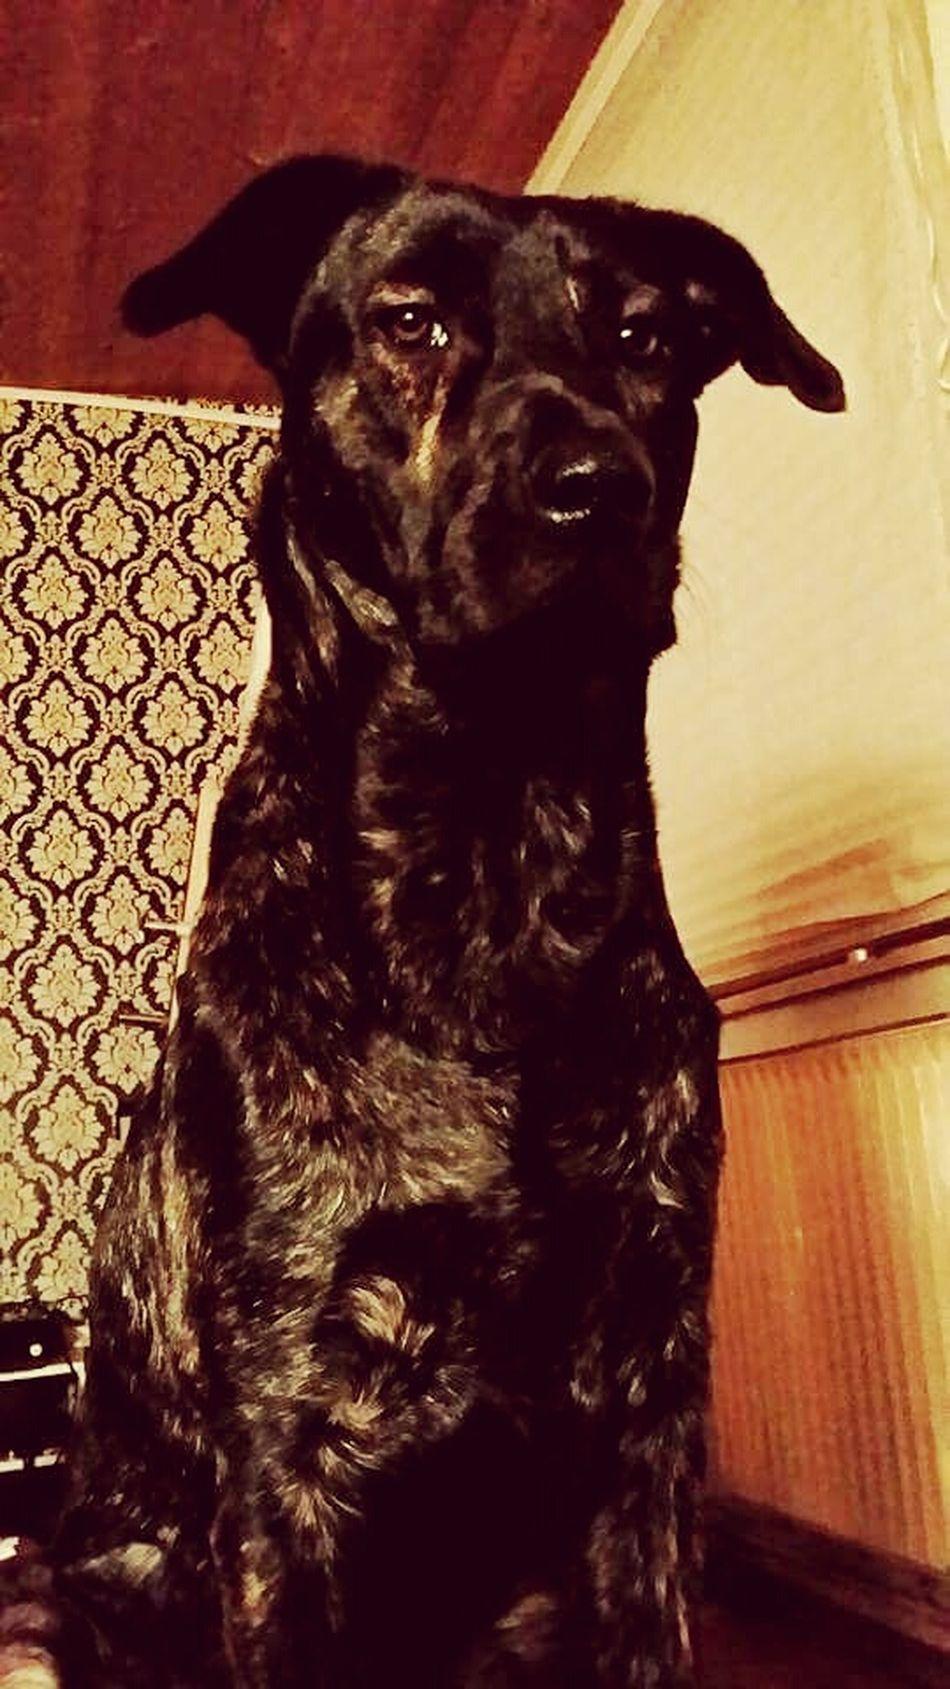 Dog Love♡ MyBabyBoy Bestfriend❤ Mybodyguard MeinLeben! EndlessLove Pets